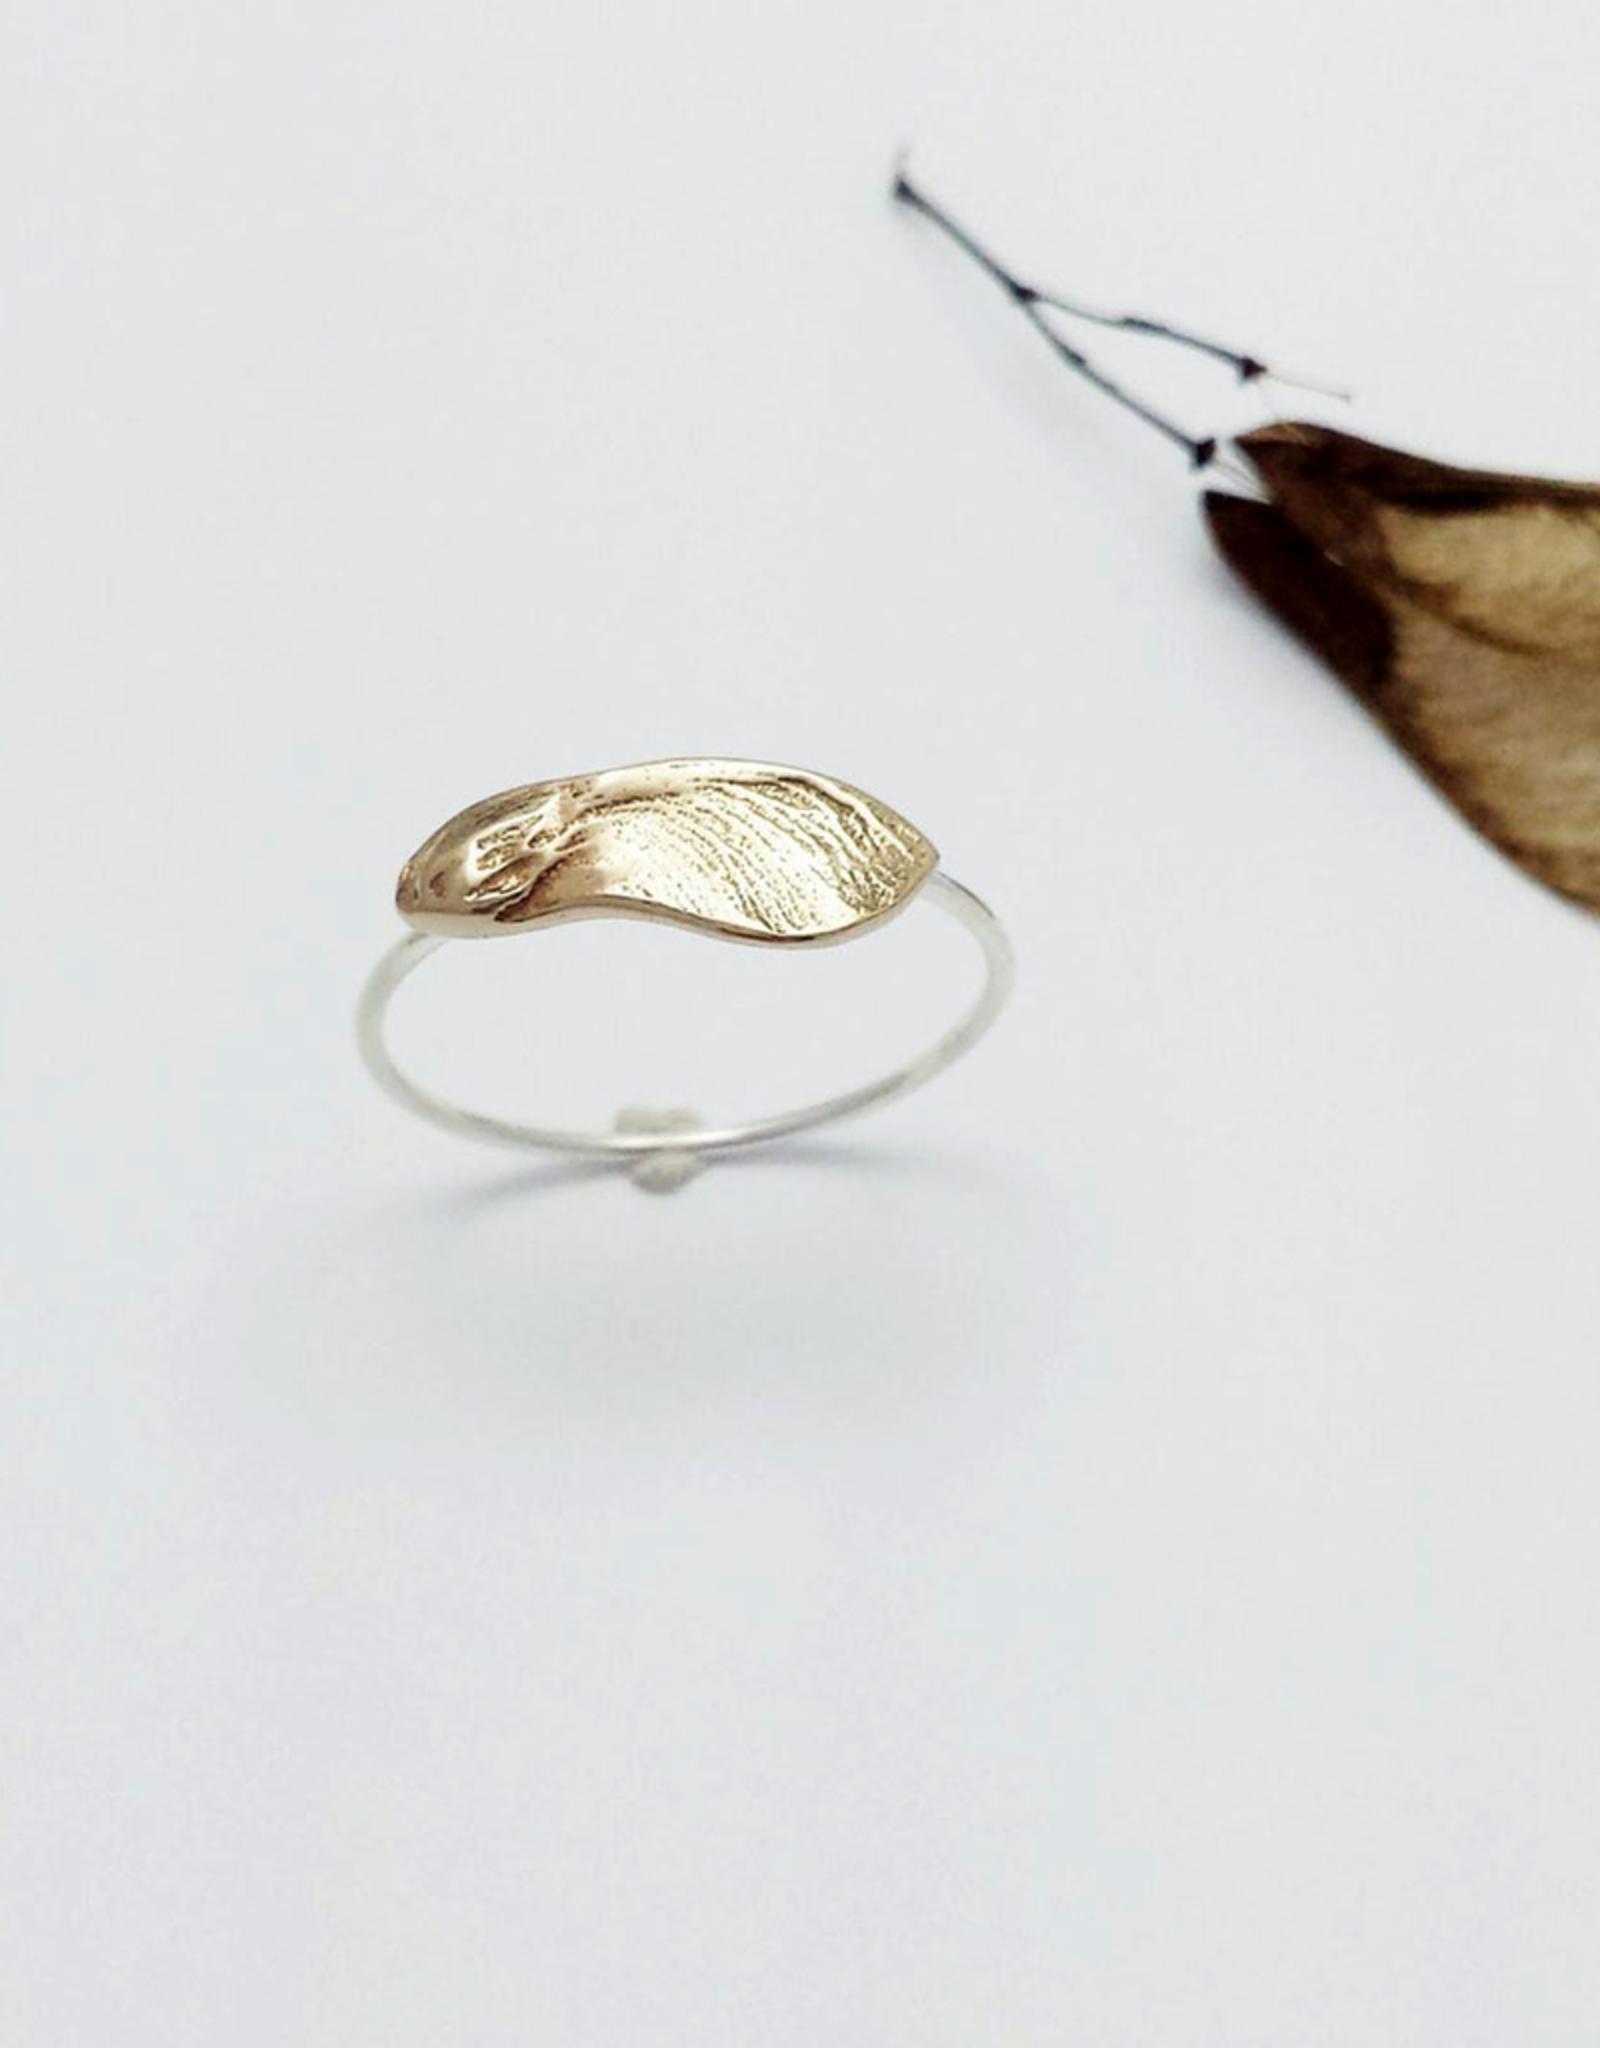 Handmade Cast Maple Key Ring - Bronze